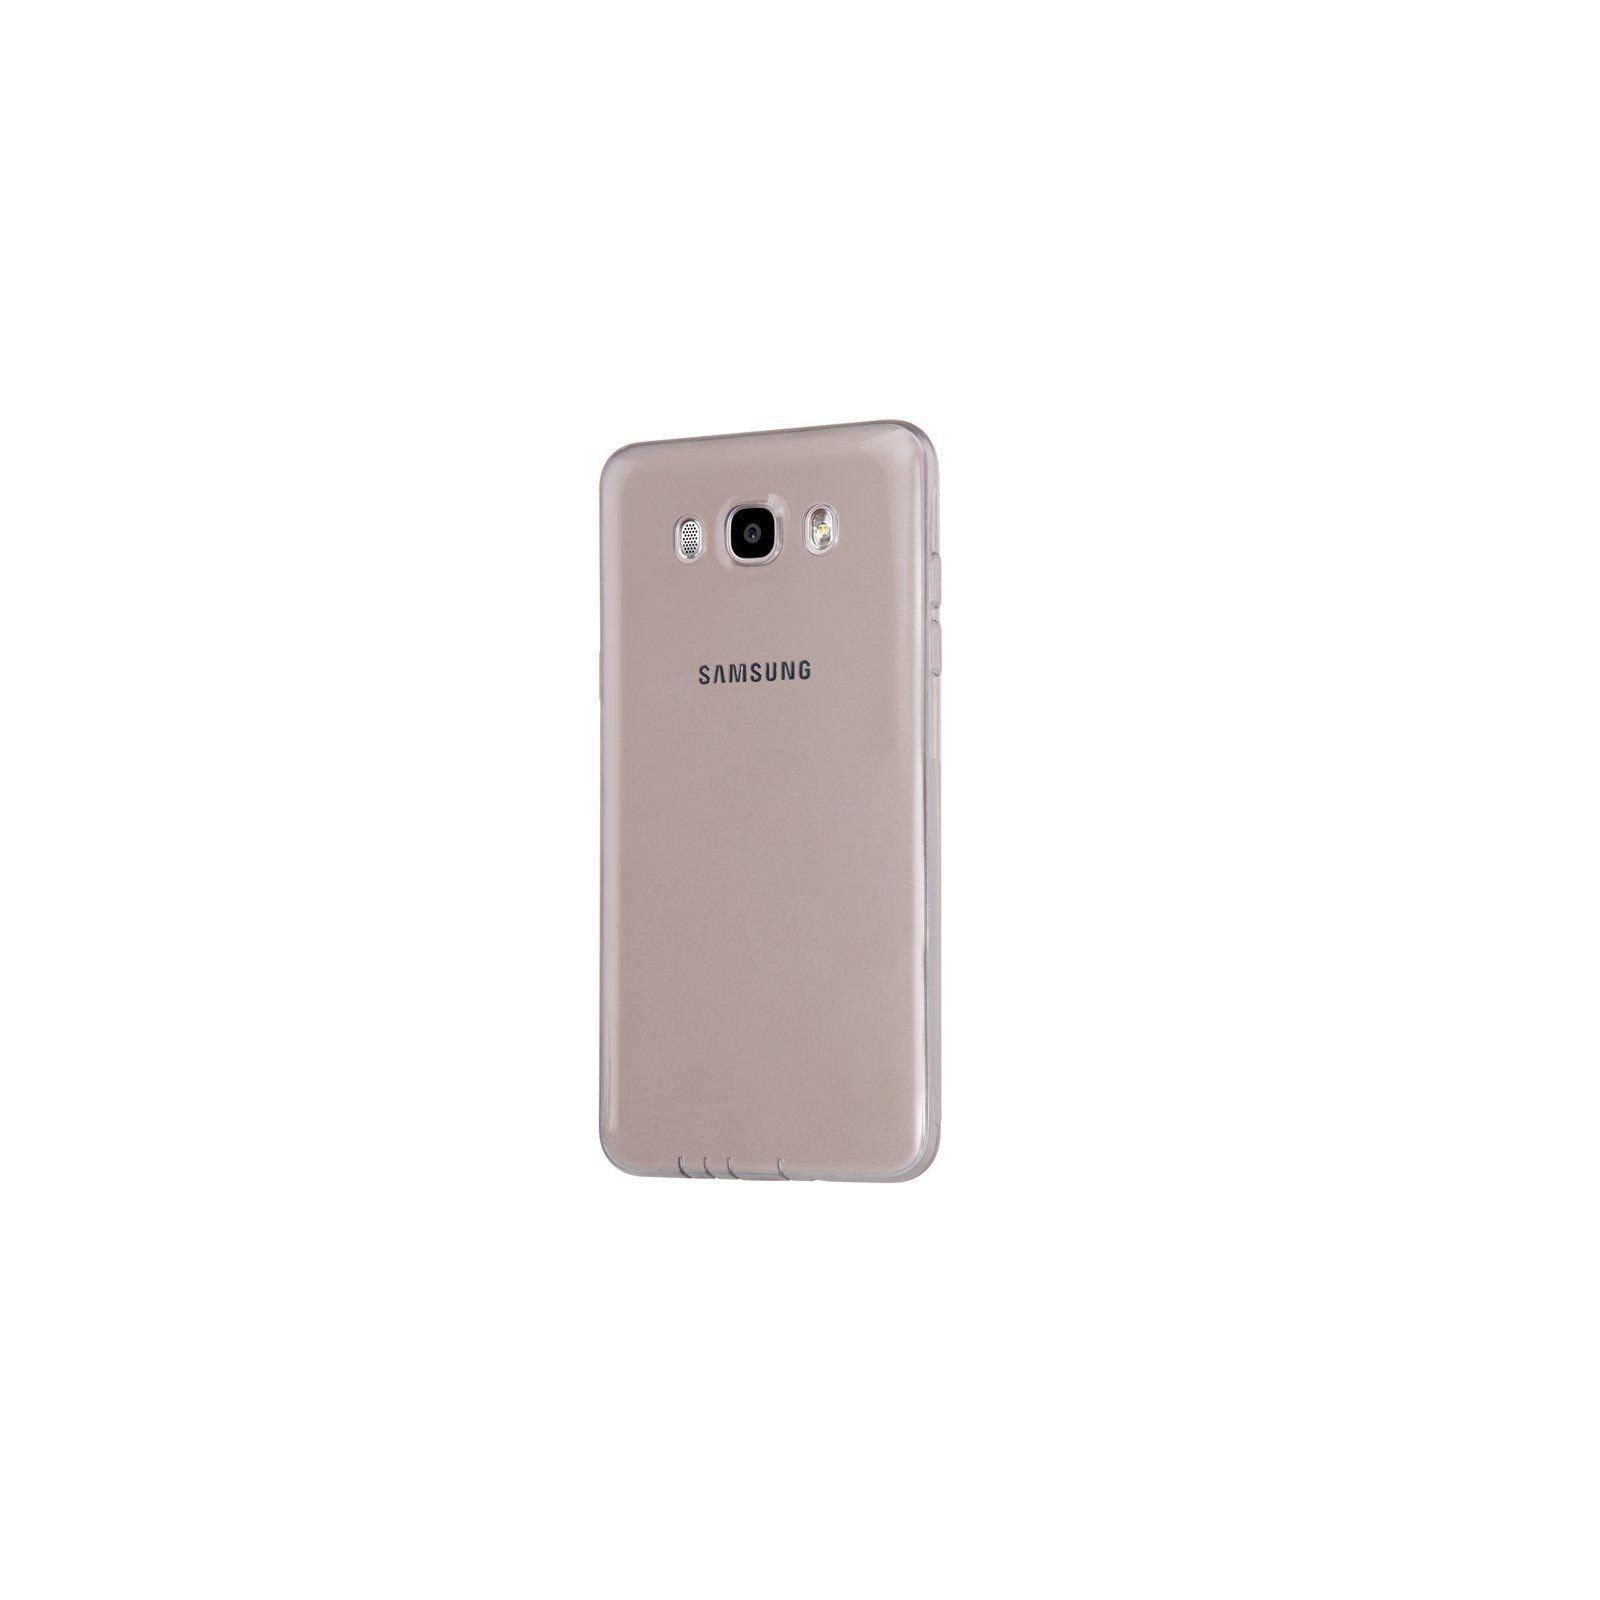 Чехол для моб. телефона SmartCase Samsung Galaxy J7 / J710 TPU Clear (SC-J710) изображение 2